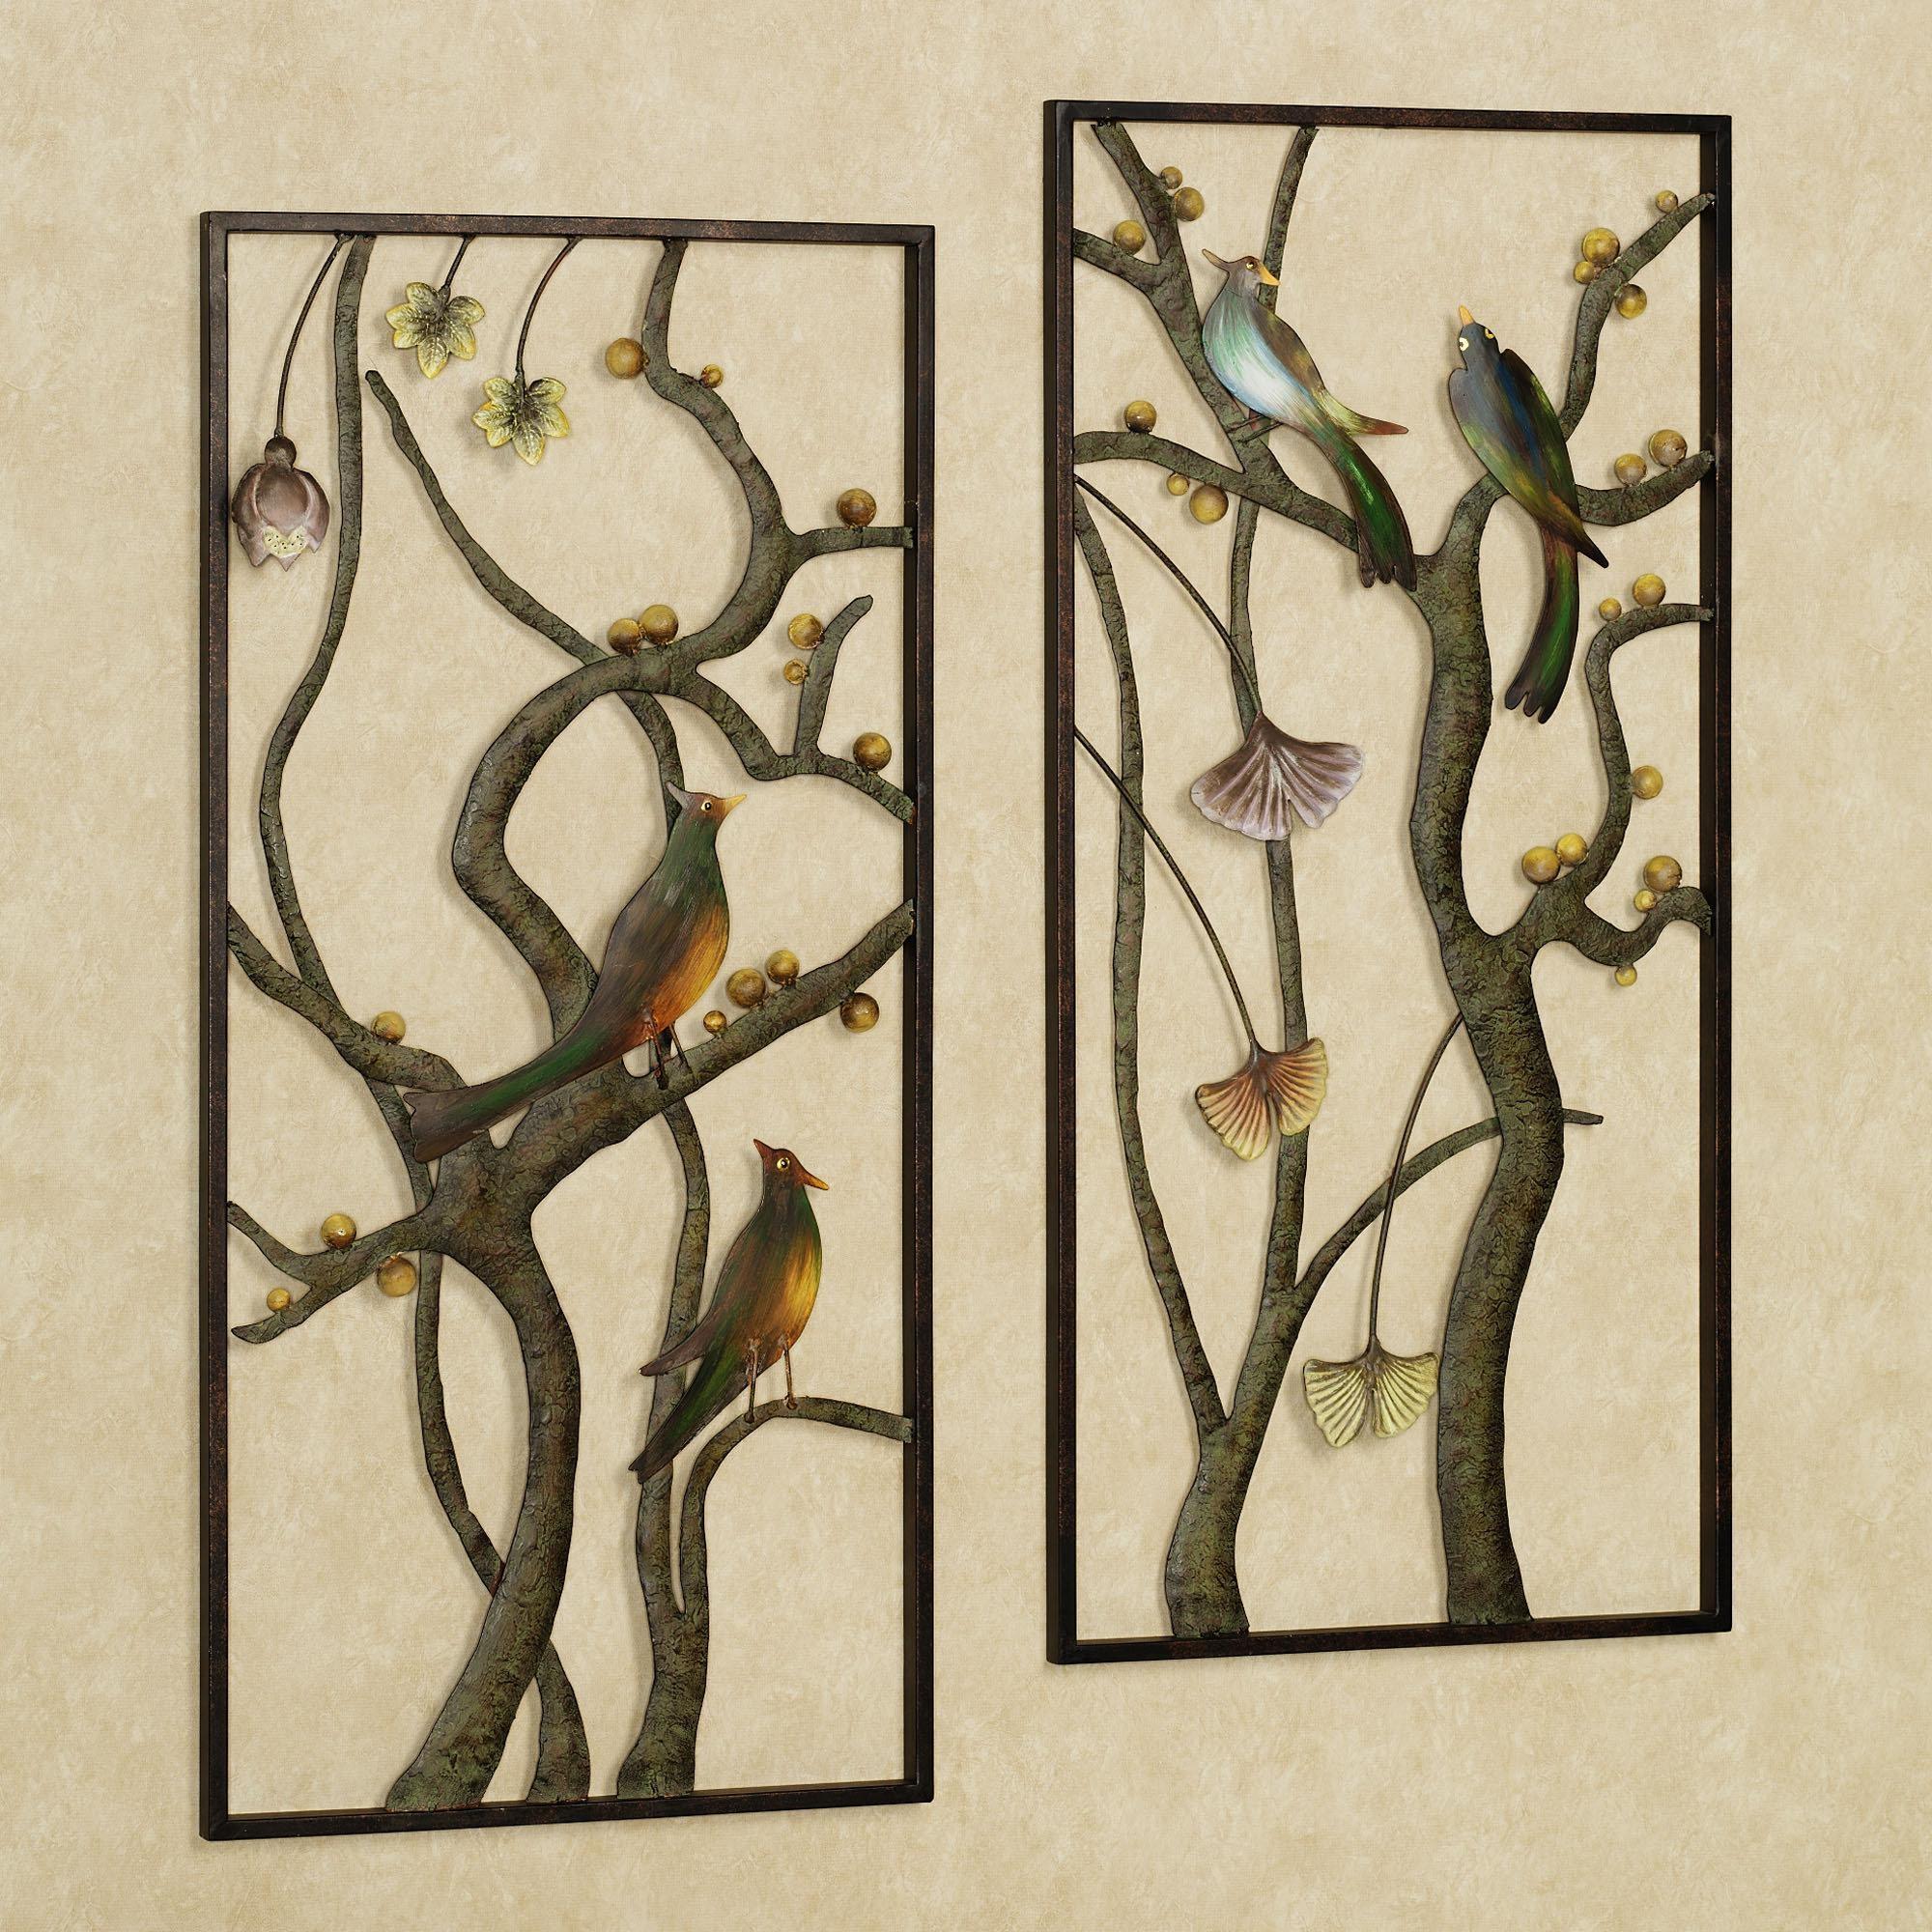 Decoration (Image 8 of 20)